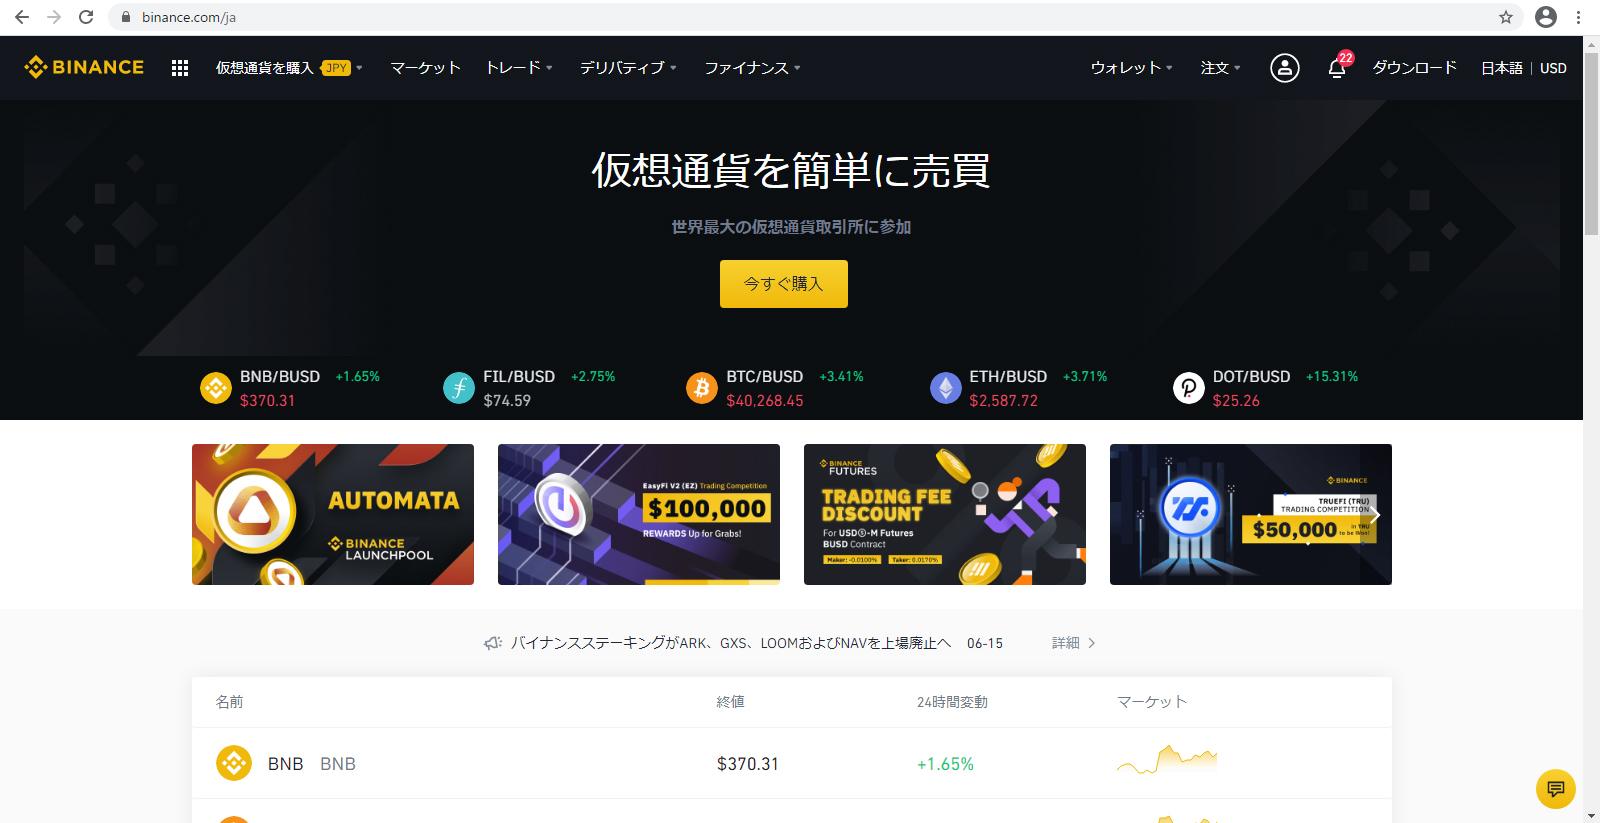 Binance(バイナンス)と公式サイト日本語対応